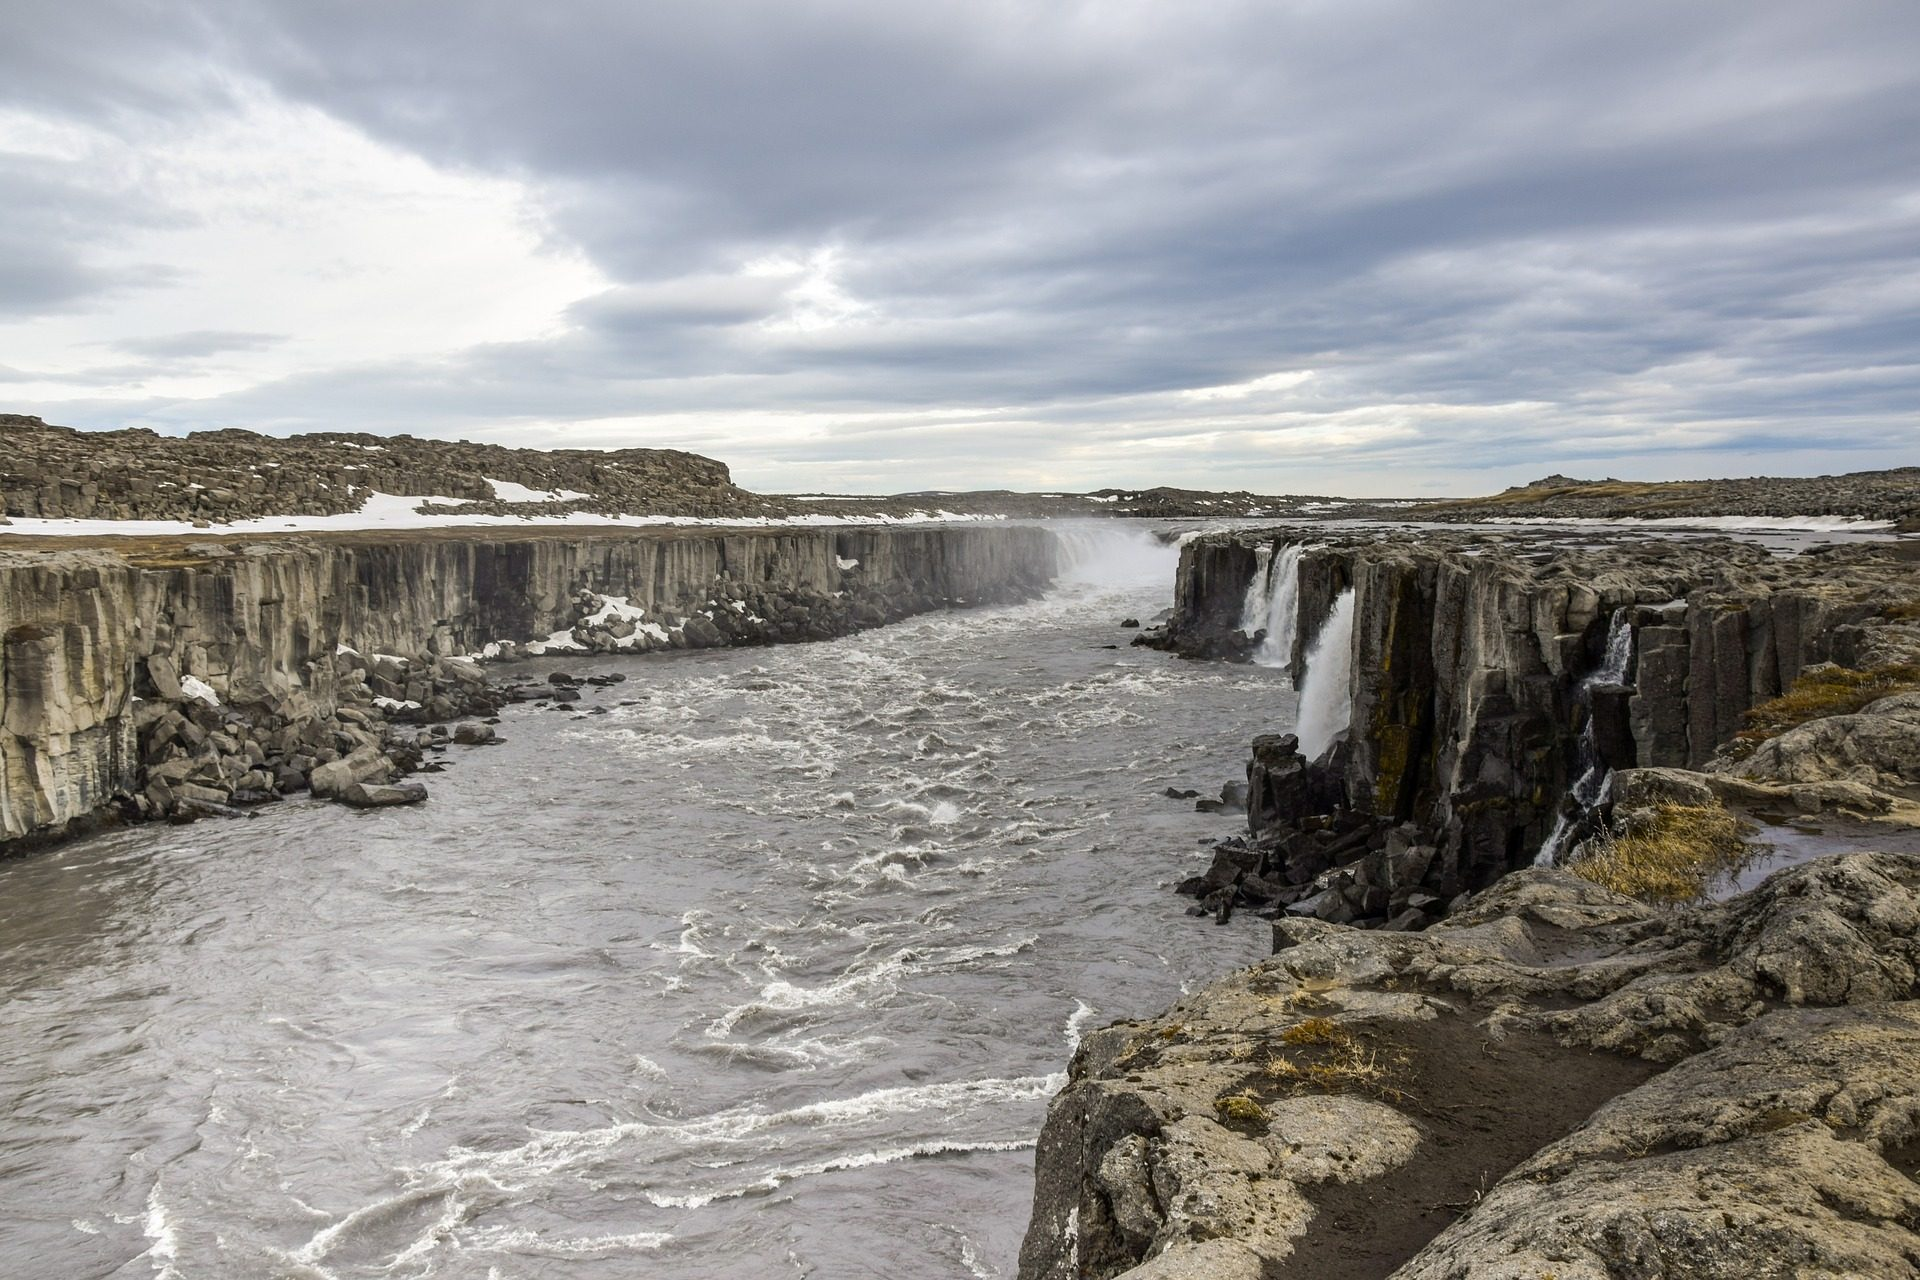 Cascate, cade, Rocas, pietre, disgelo, neve, Islanda - Sfondi HD - Professor-falken.com